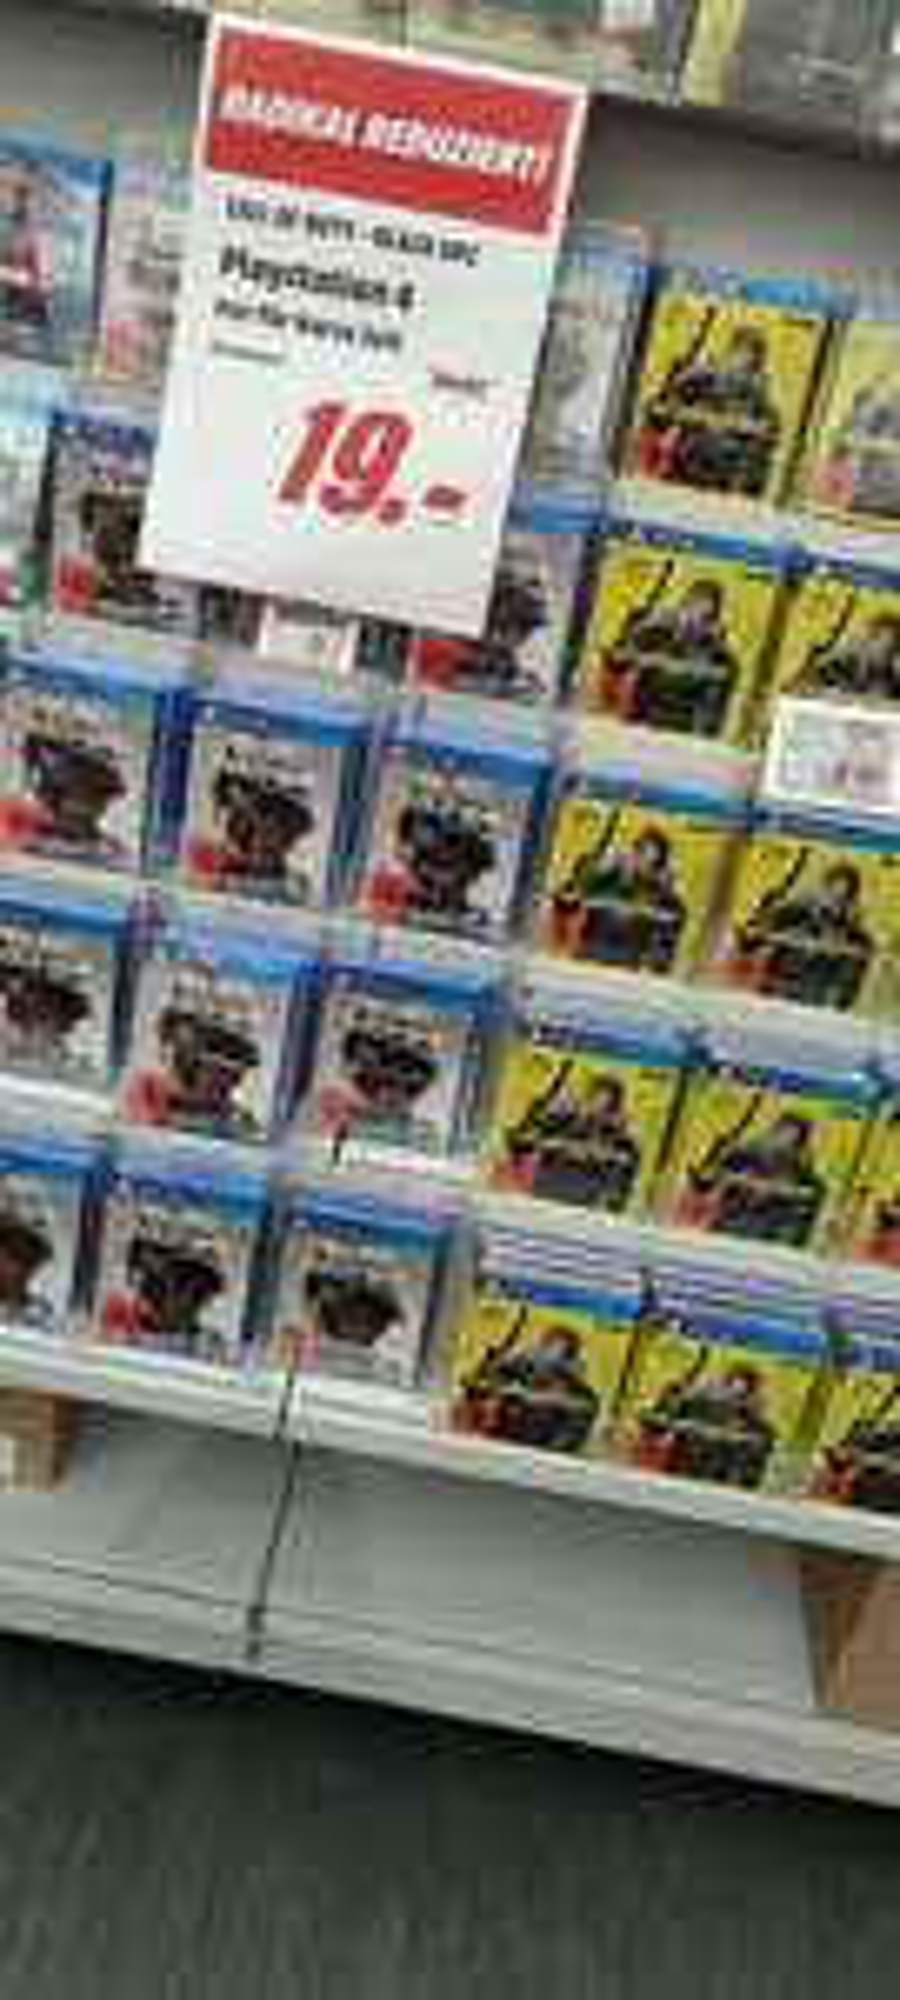 PS4 Call of Duty Cold War für 19€ - Media Markt Hamburg Nedderfeld